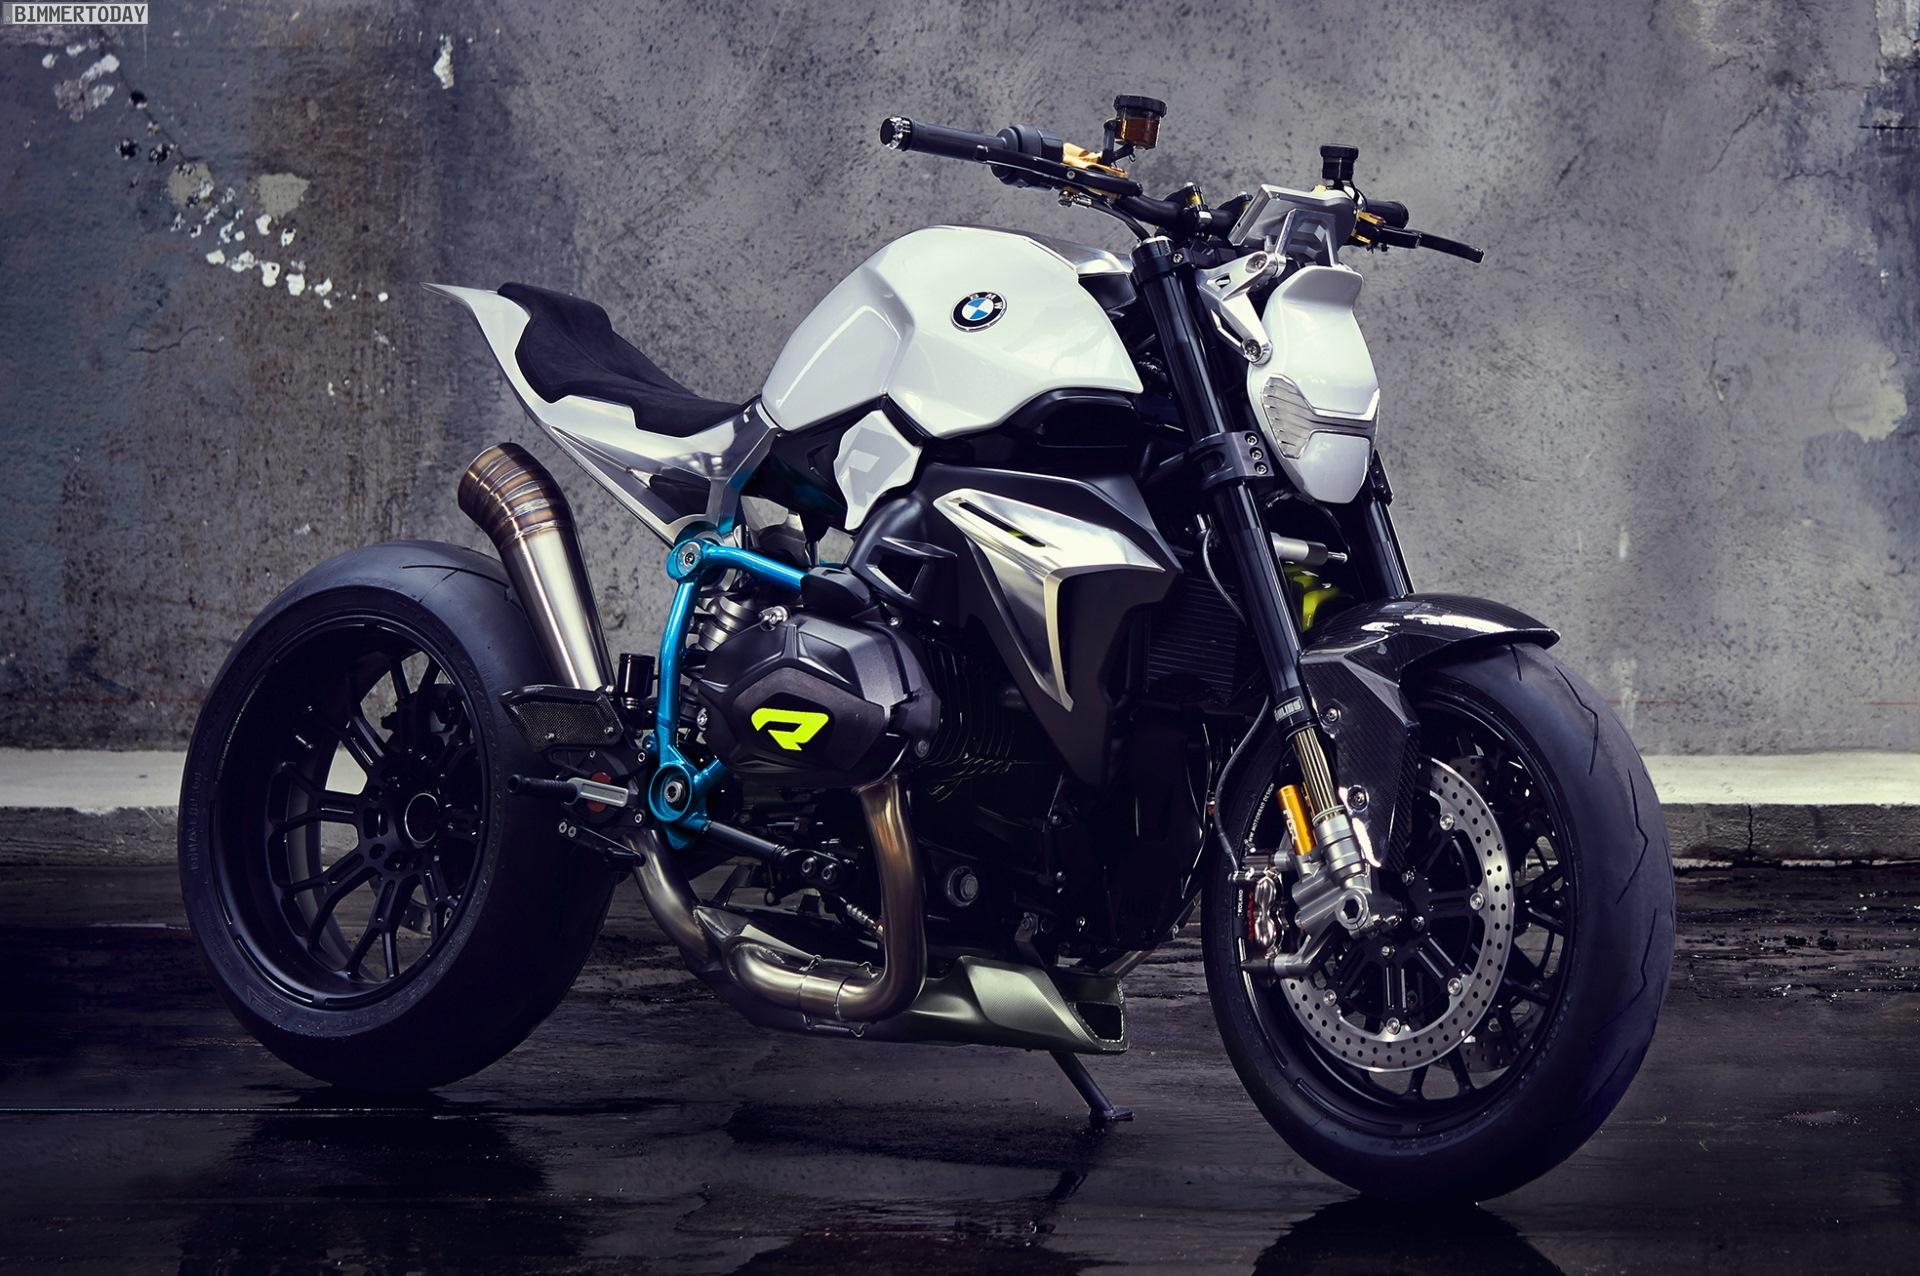 Bmw Roadster Concept Design Studie Zum Concorso D Eleganza